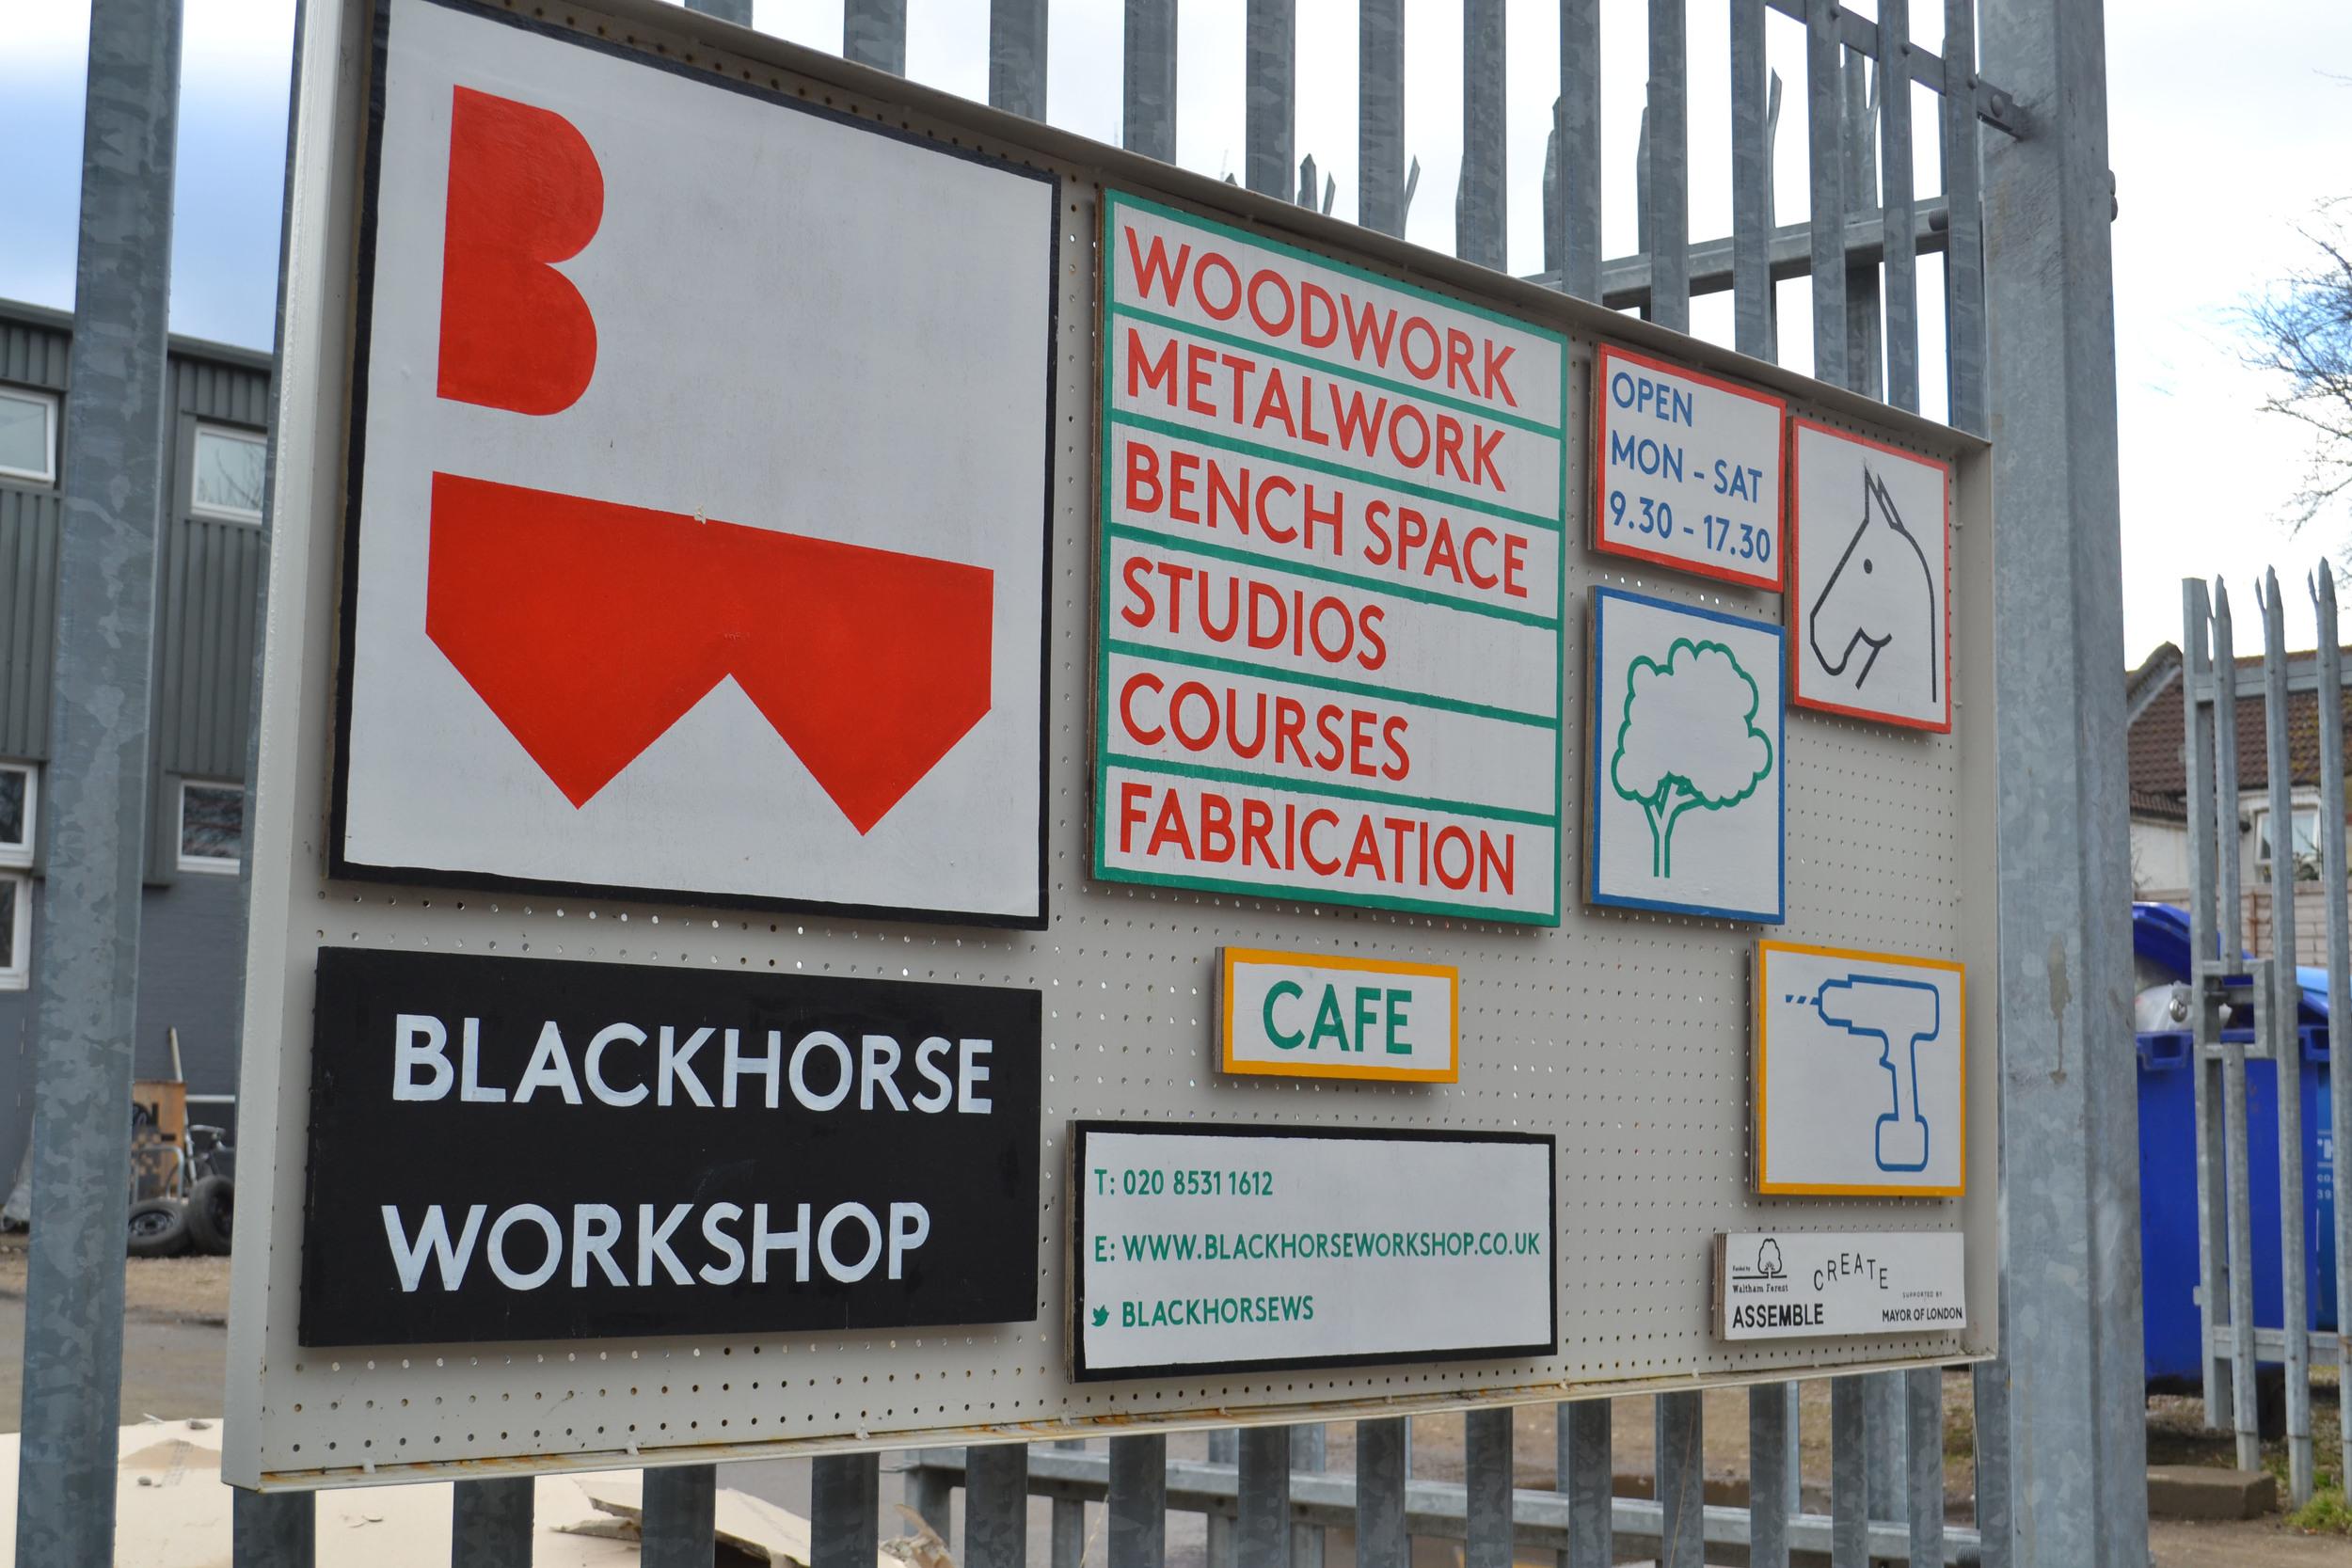 Blackhorse Workshop